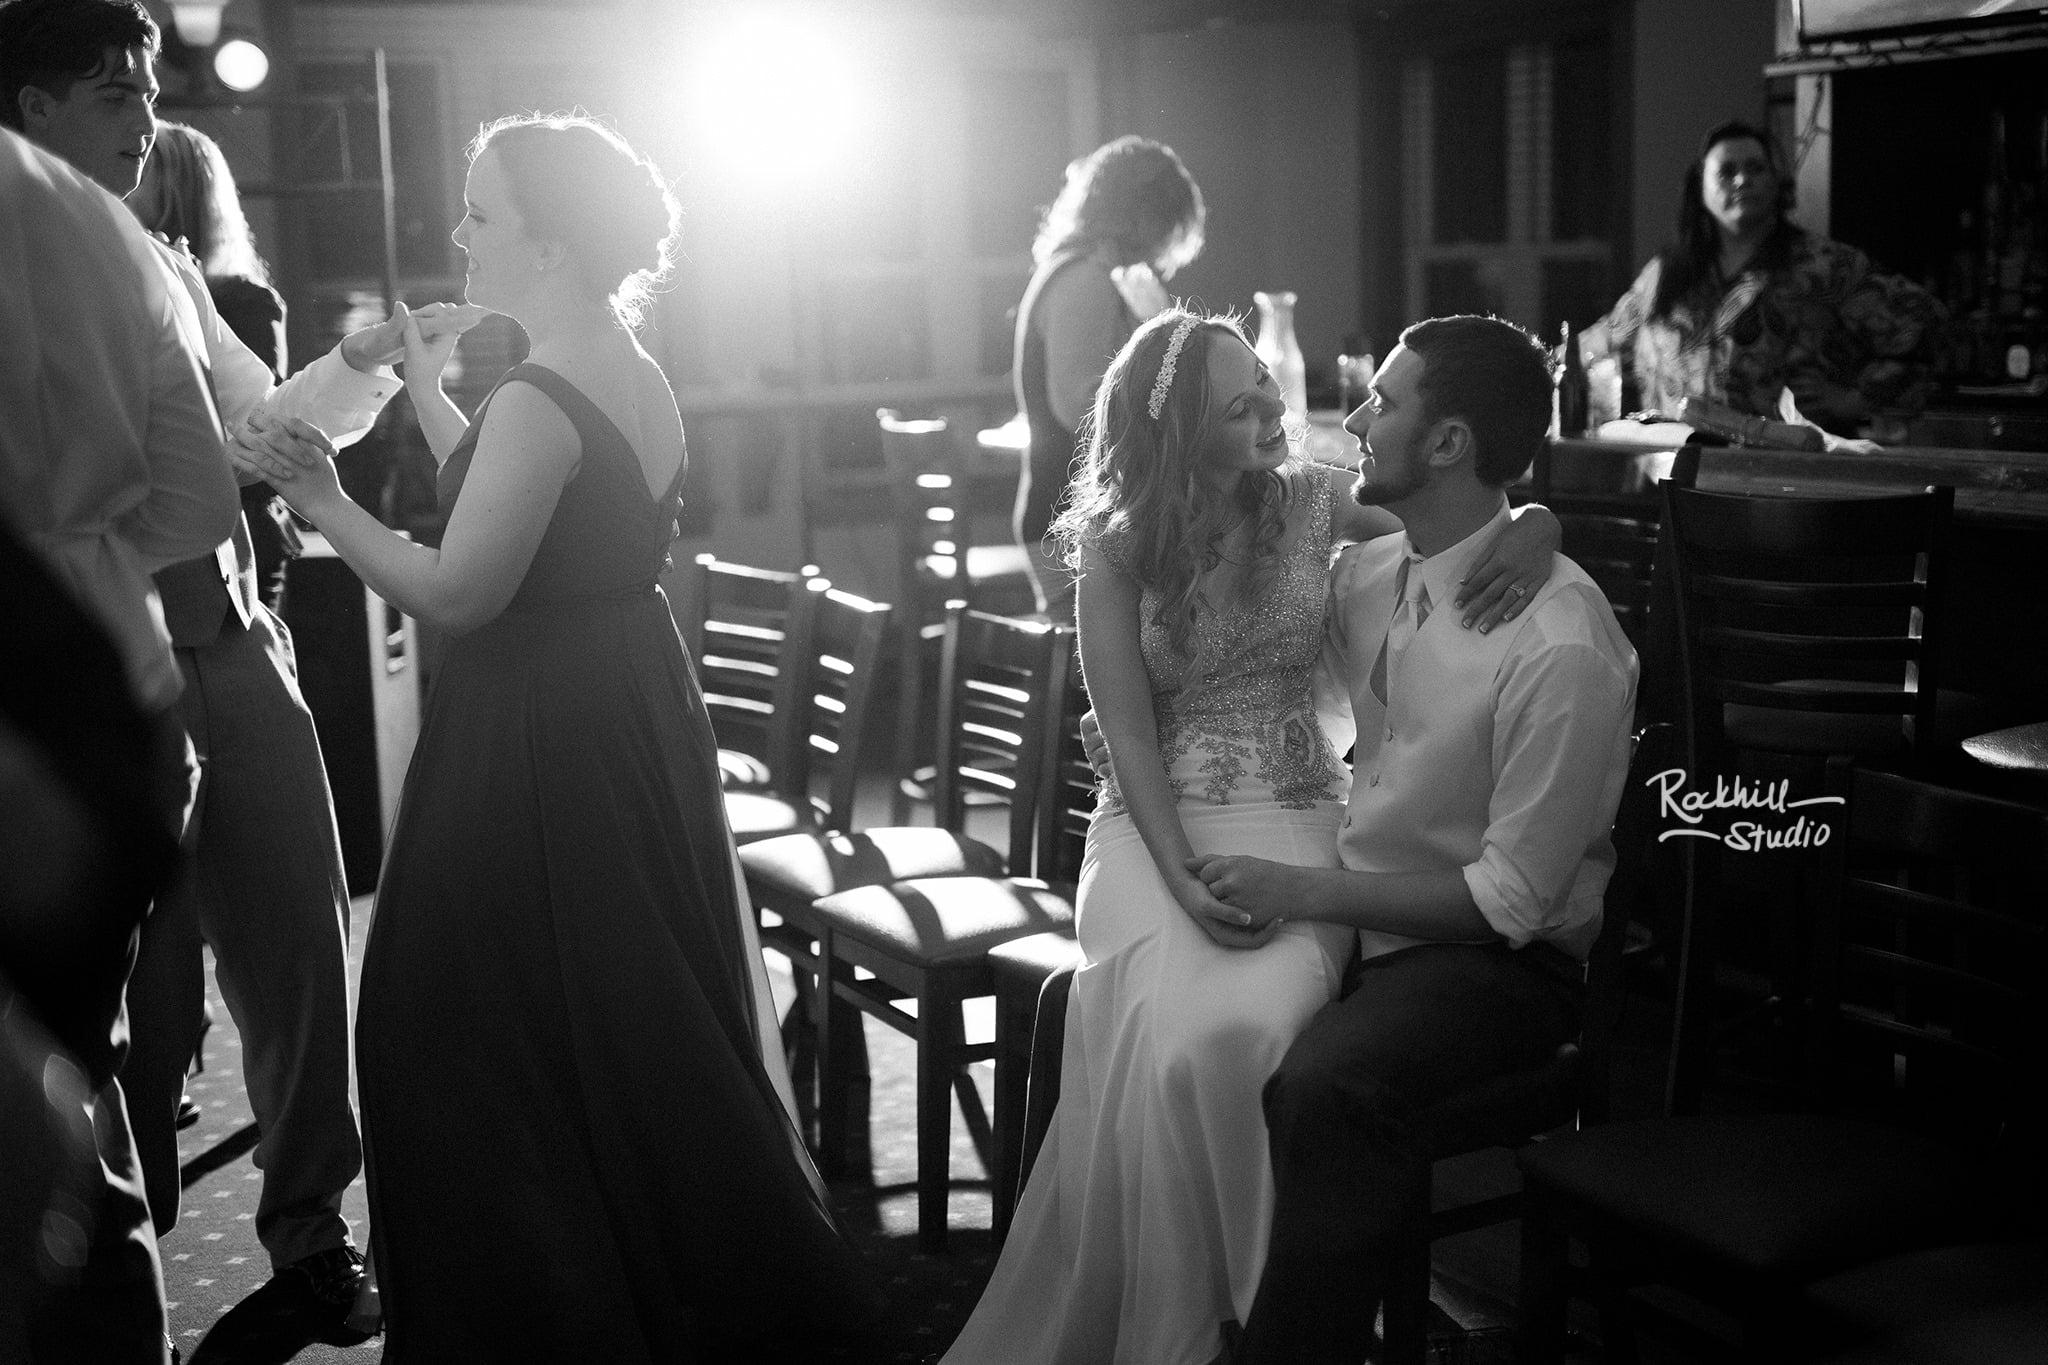 marquette-wedding-photographer-rockhill-studio-reception-michigan-bride-groom.jpg